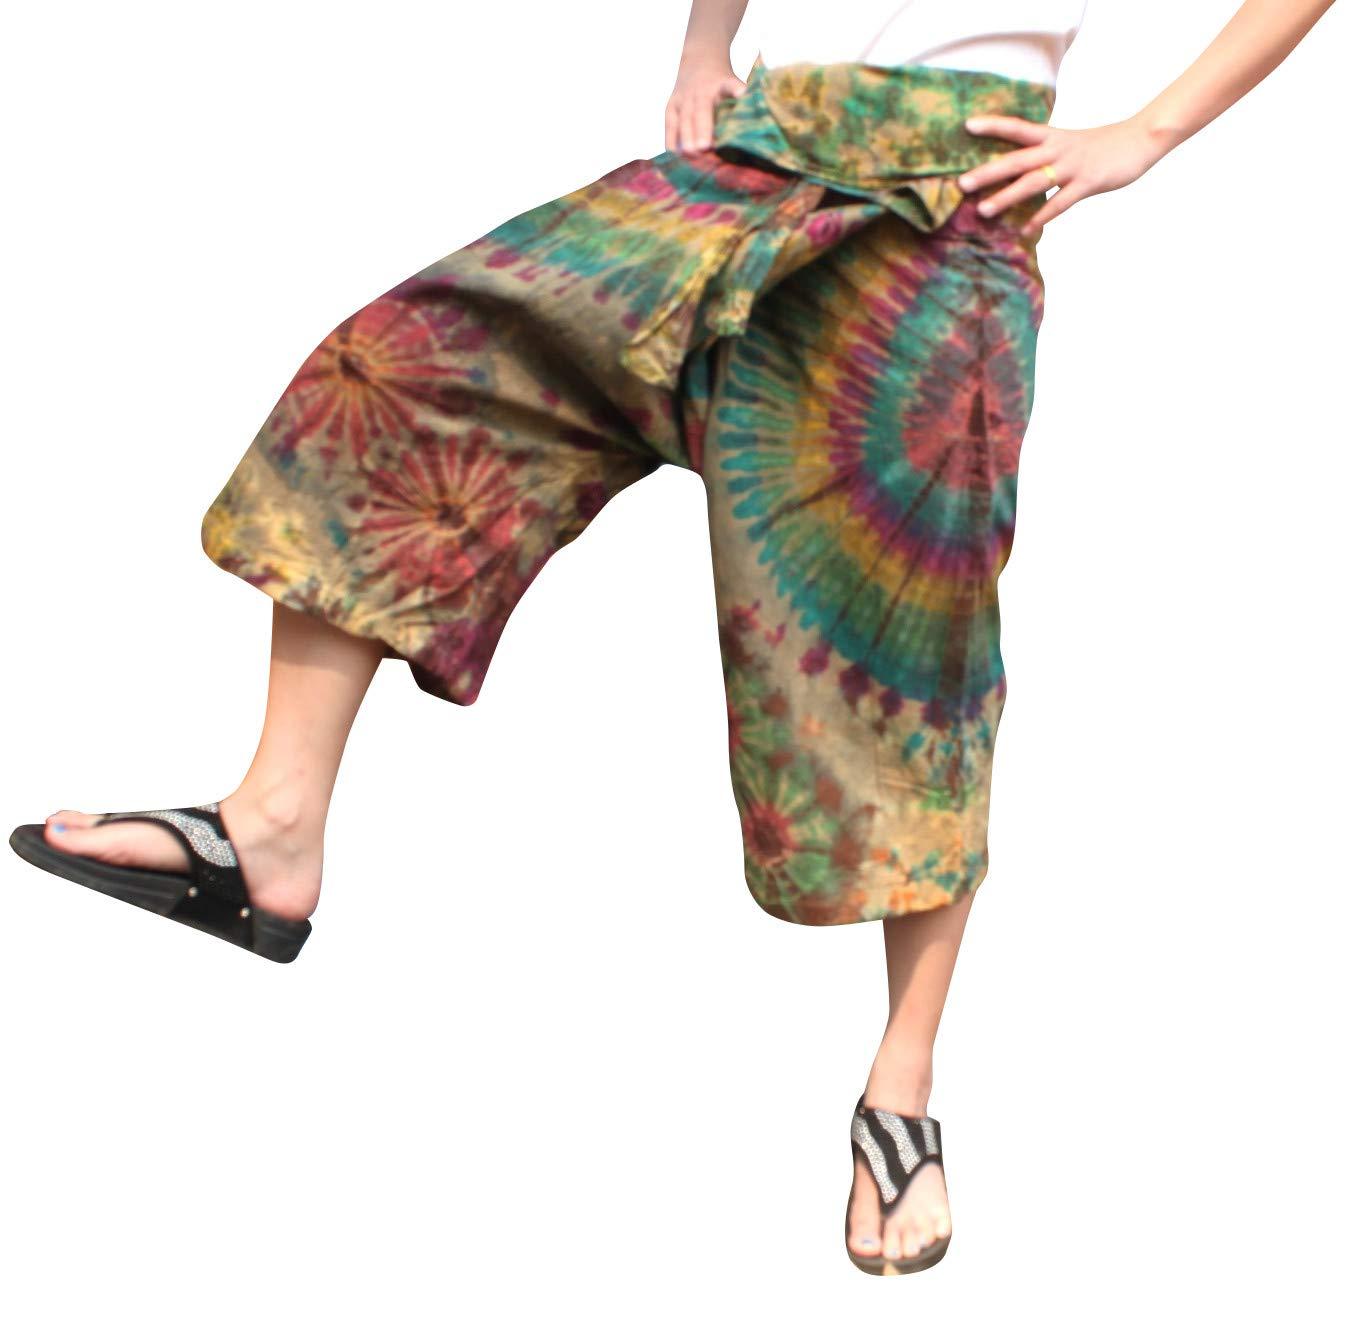 Full Funk Cotton Tie Dyed Natural Colorful Thai Fisherman Wrap 3/4 Leg Pants, Medium, Beaver Brown by Full Funk